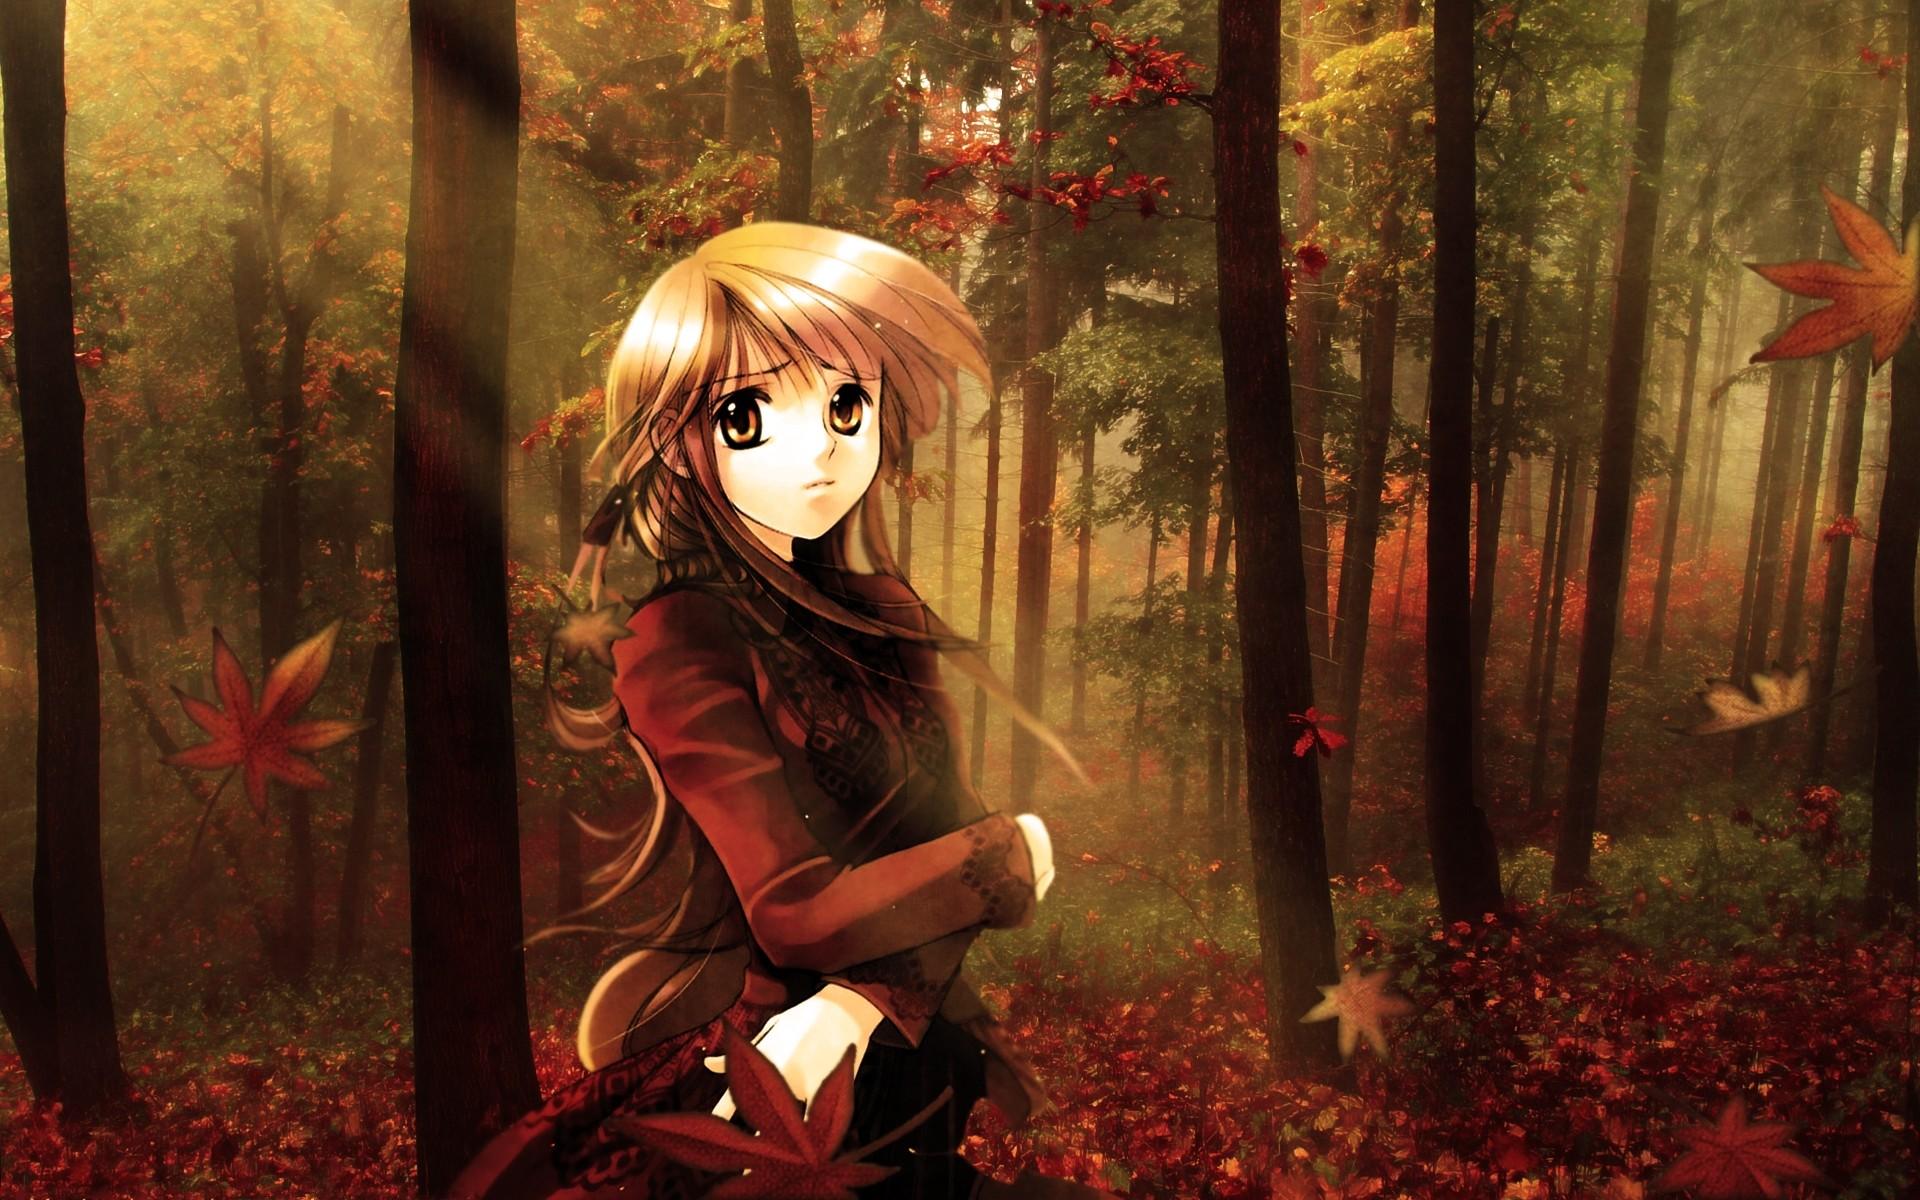 Anime Girl Autmn Fall HD Widescreen Desktop Wallpaper